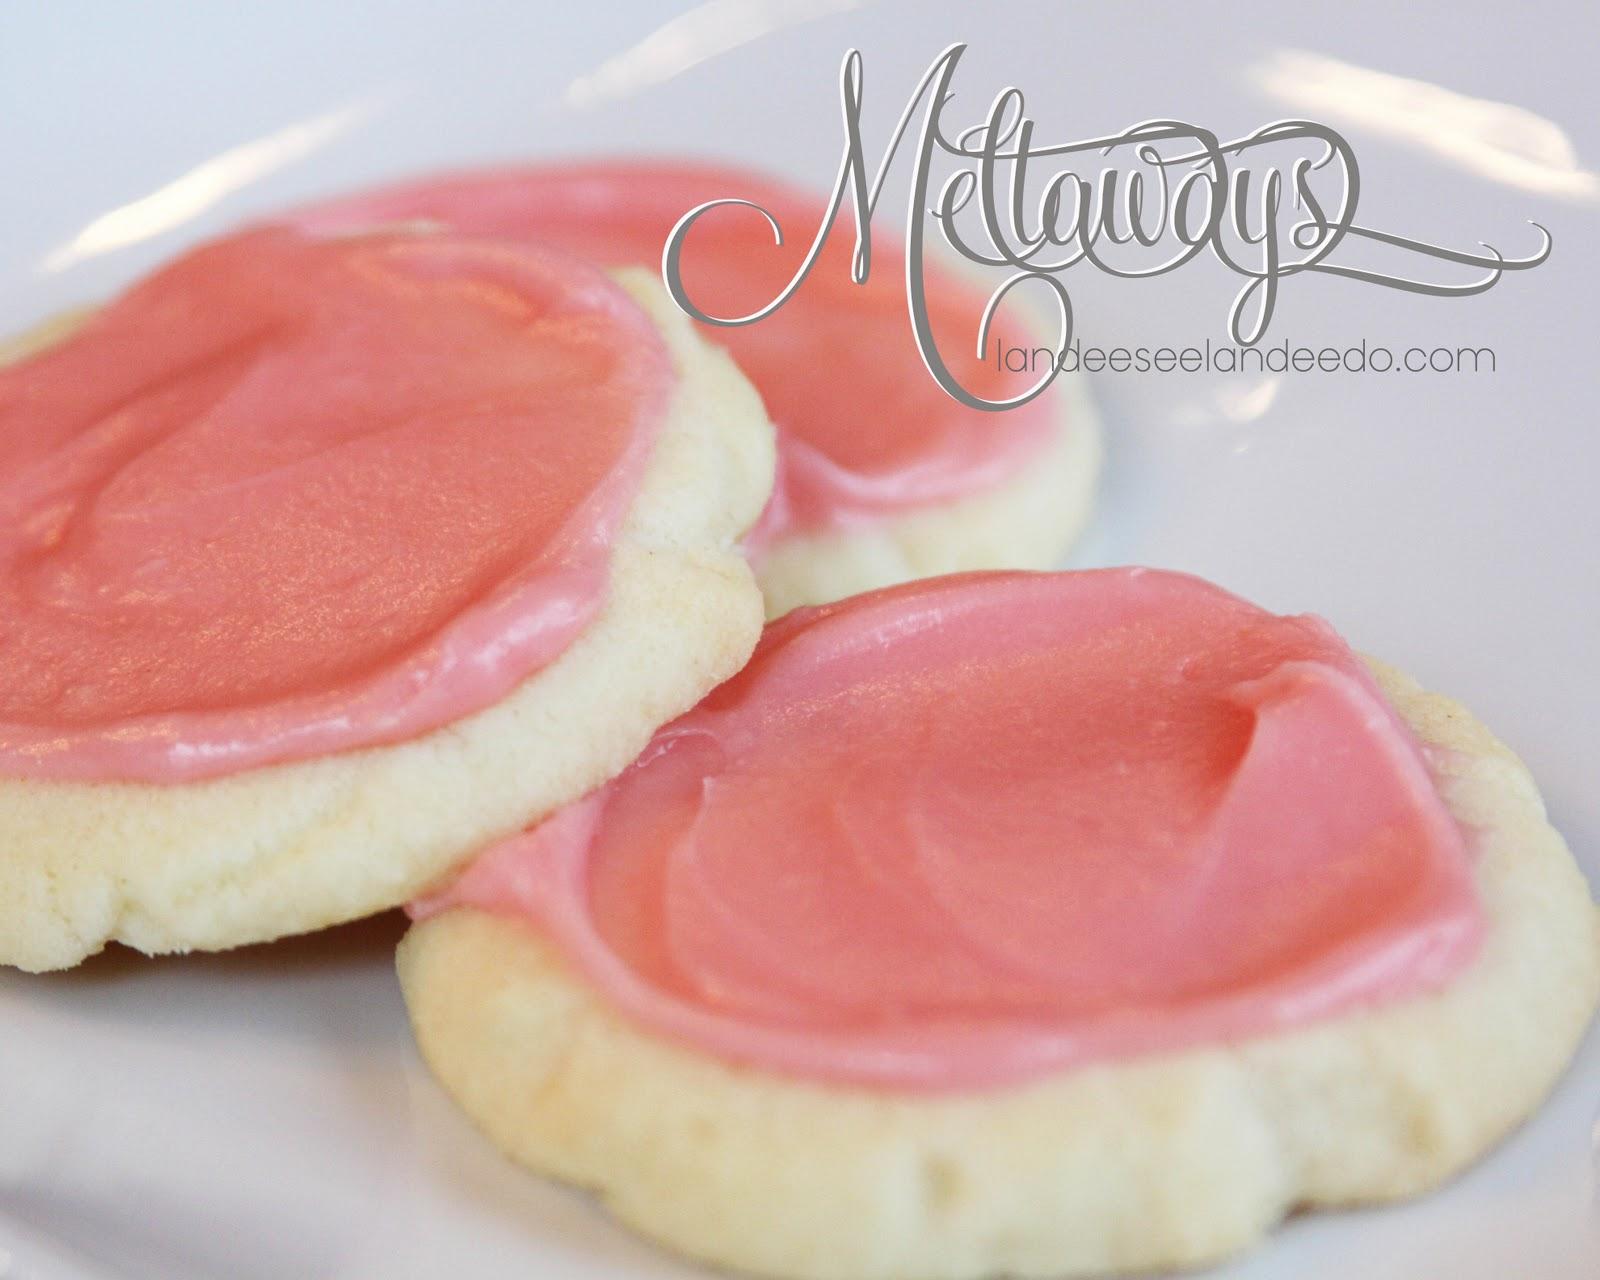 Cream cheese meltaways cookie recipe